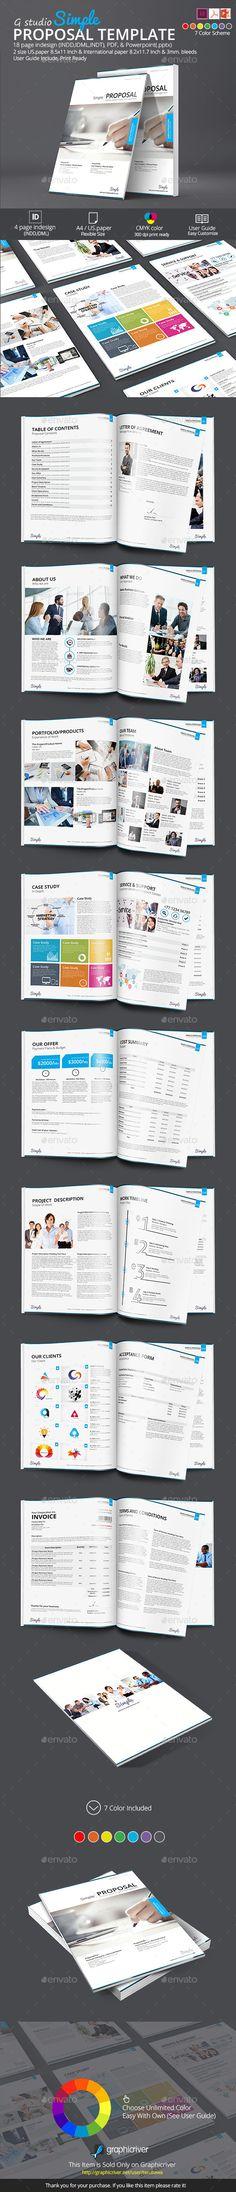 Sample Business Plan Presentation business proposal Pinterest - event planning proposal template